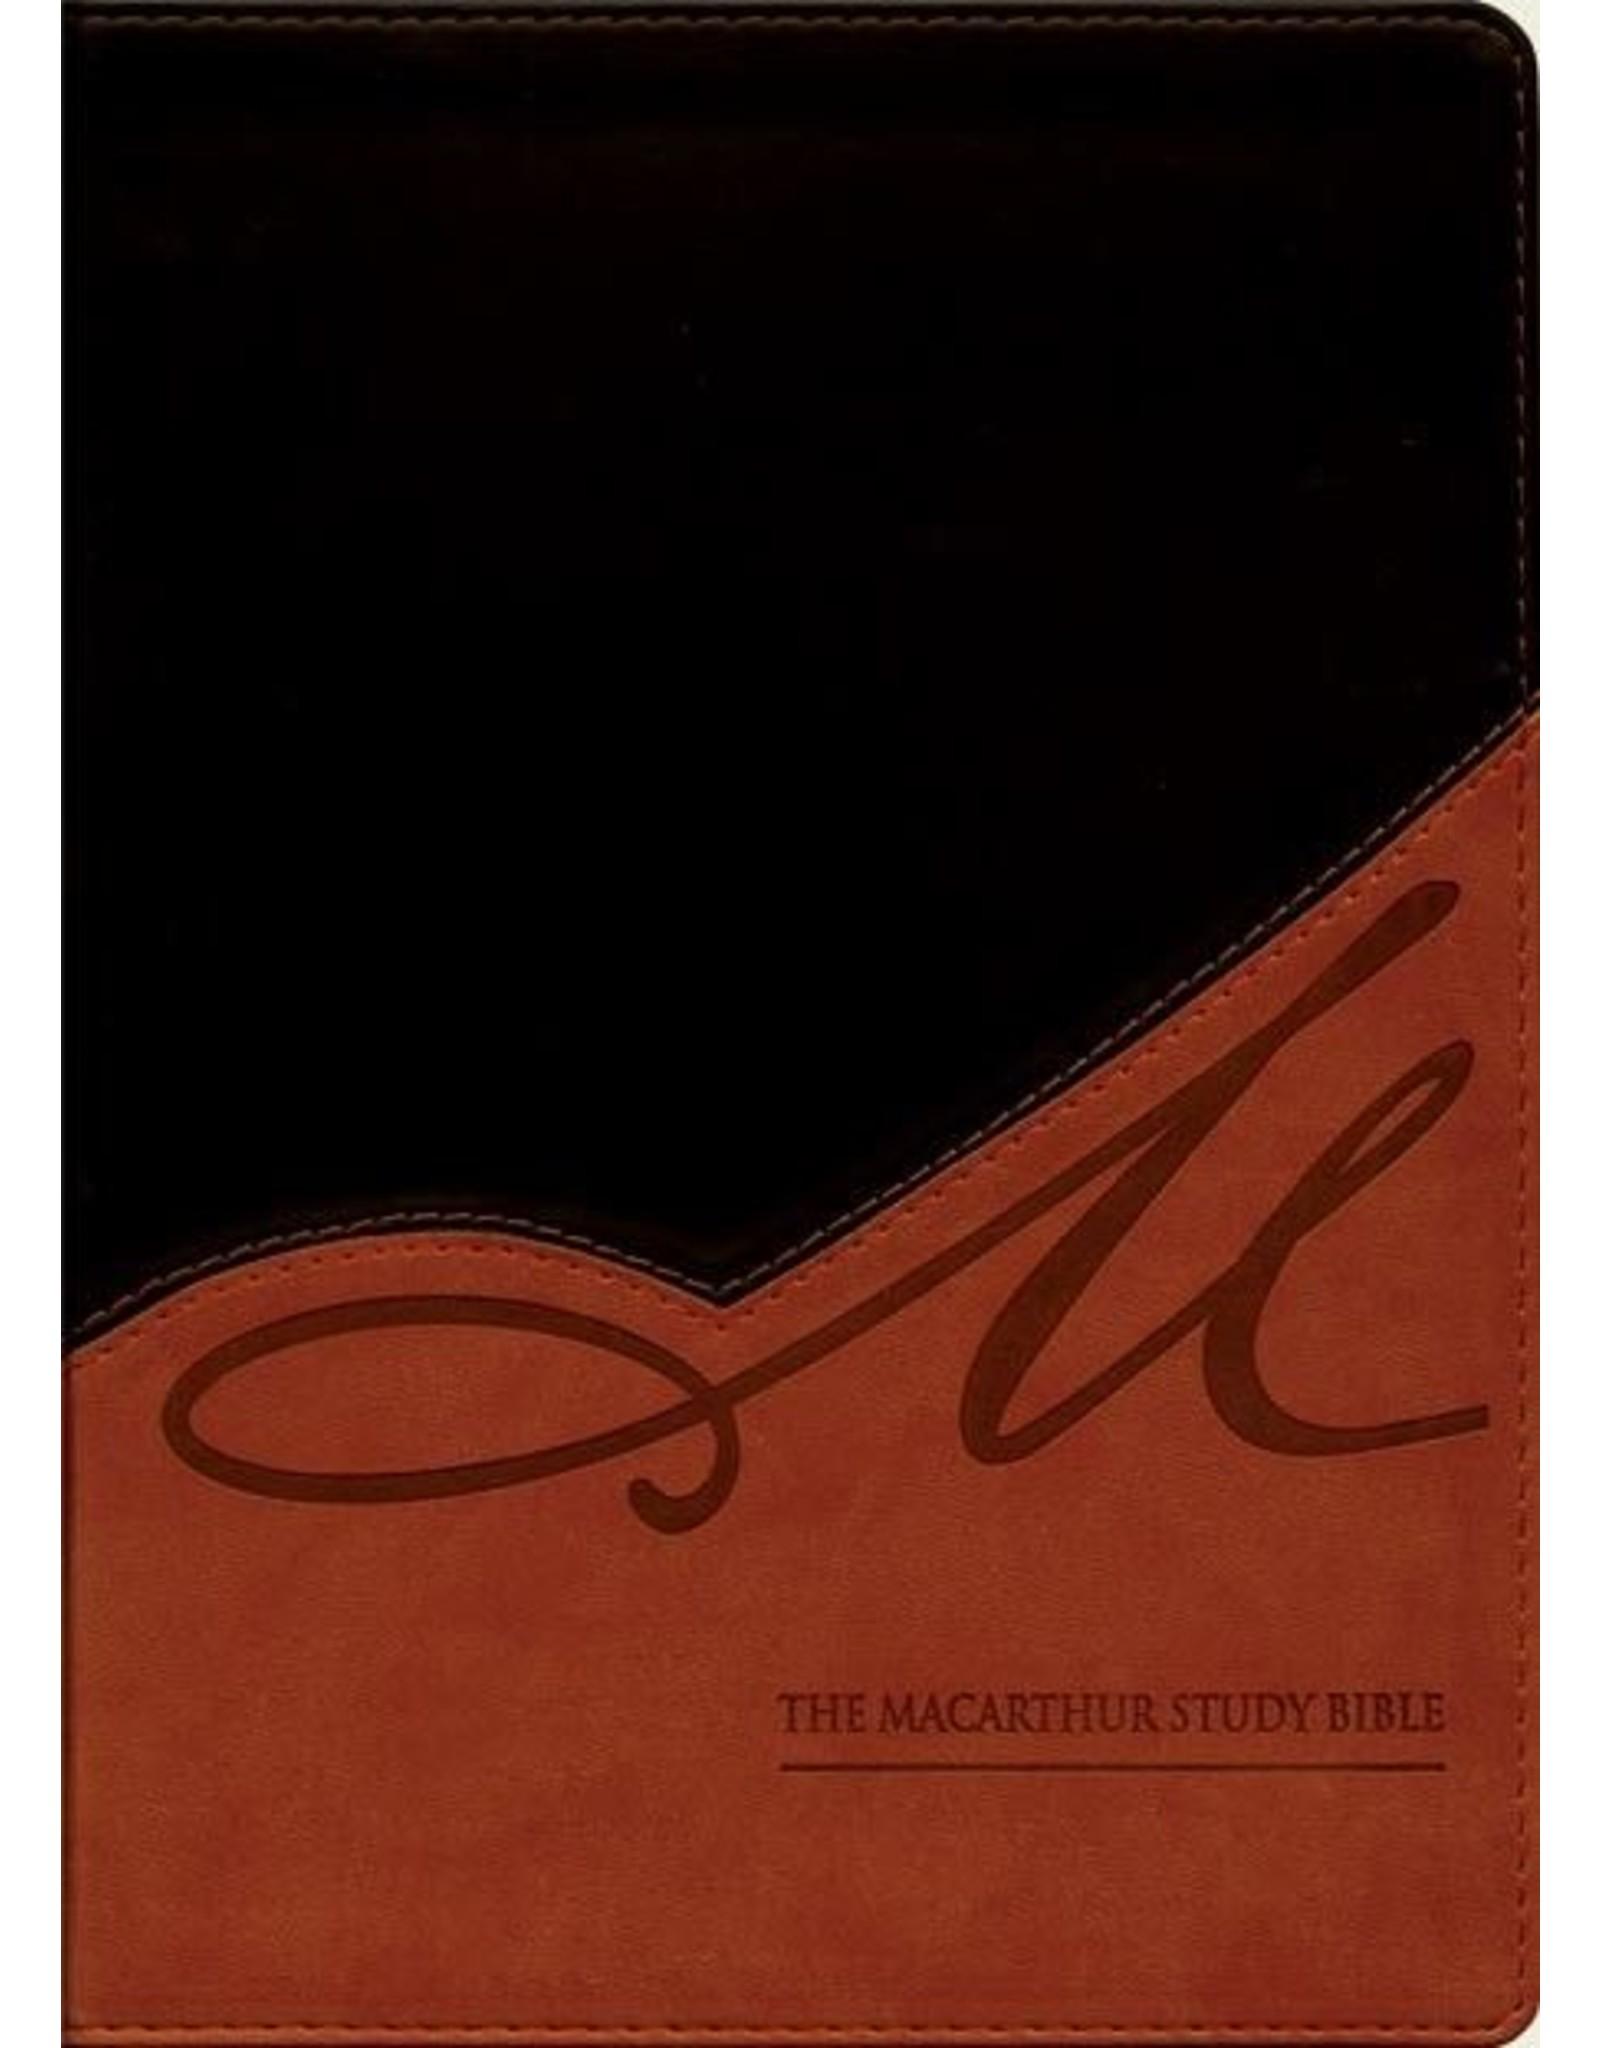 Harper Collins / Thomas Nelson / Zondervan MacArthur Study Bible: NASB Black/Terracotta-Tan LeatherSoft